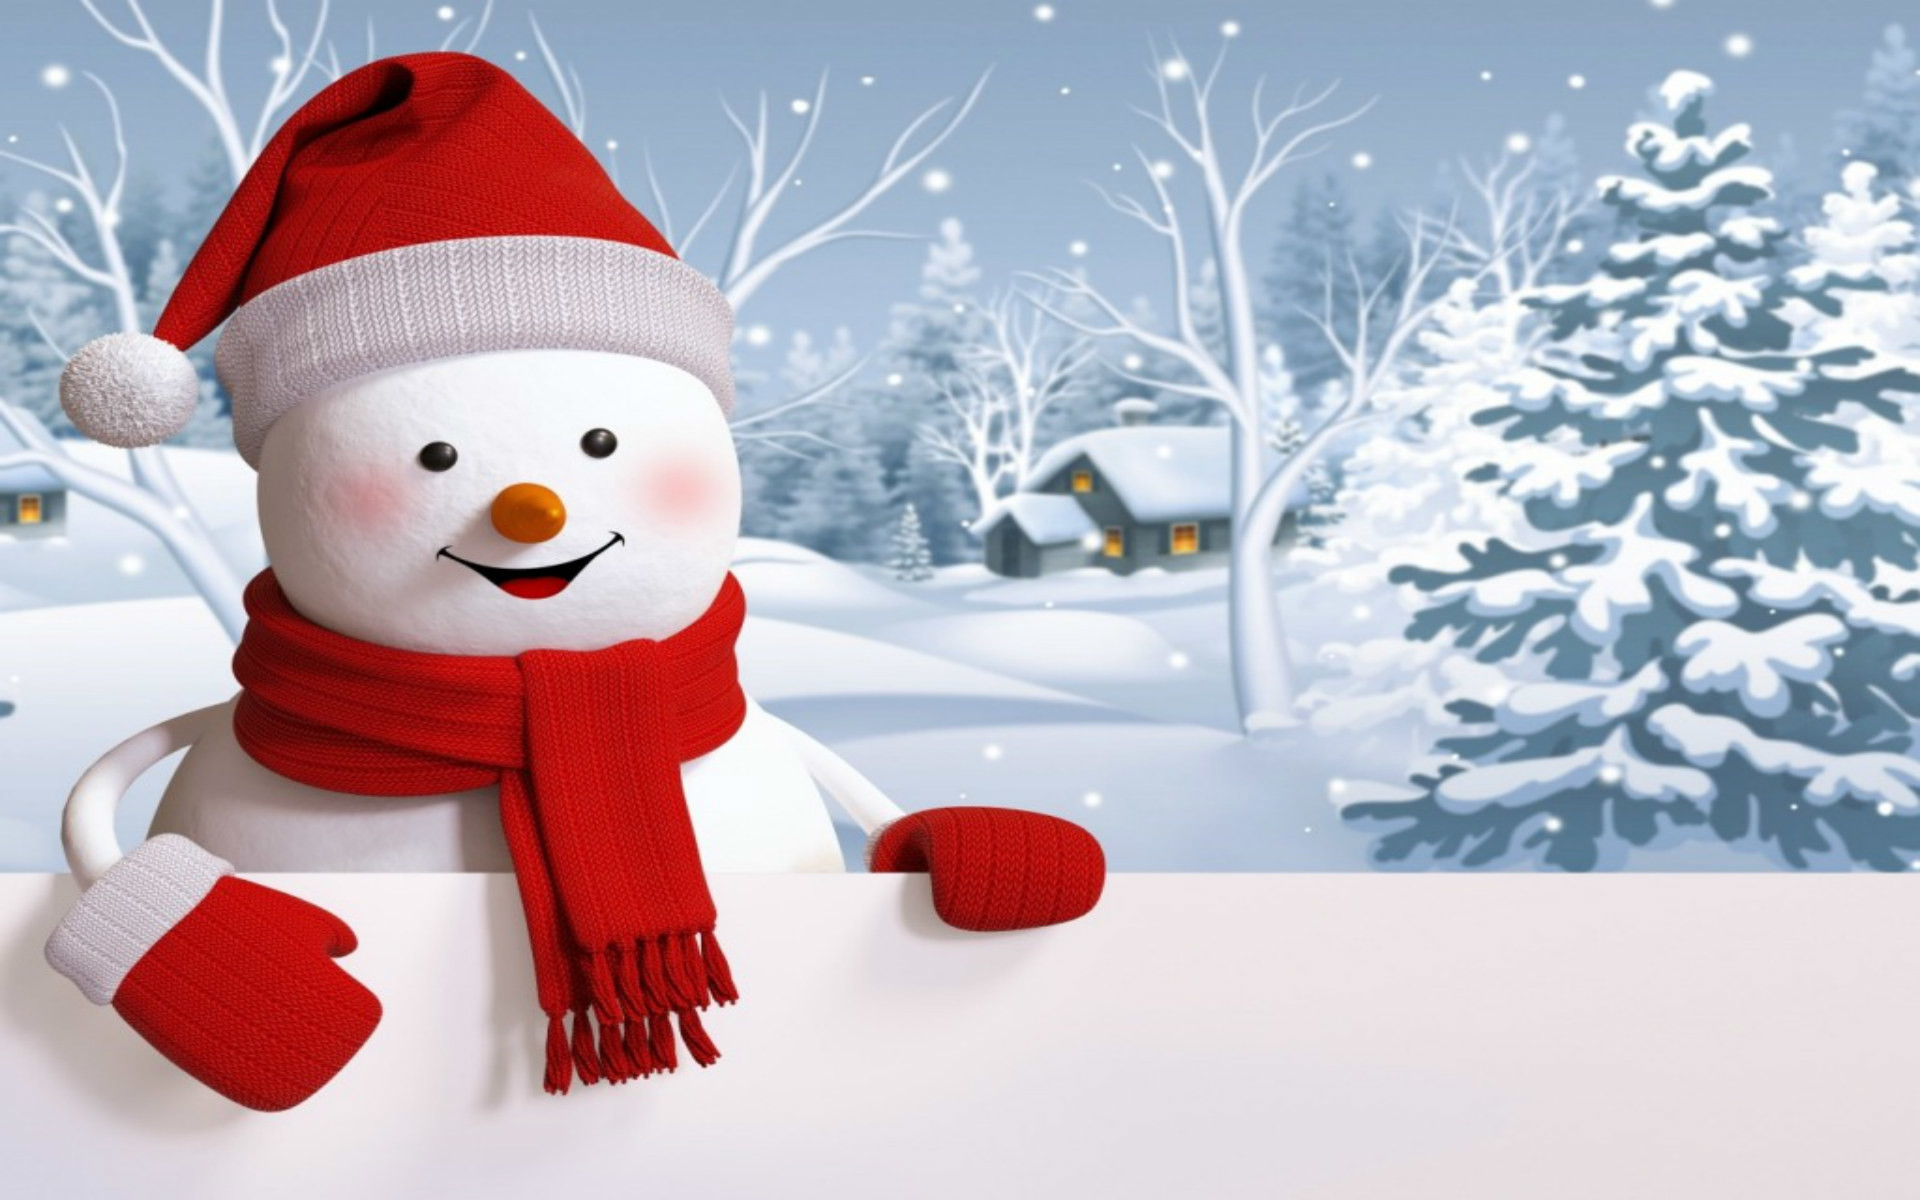 Hd Happiest Snowman Wallpaper